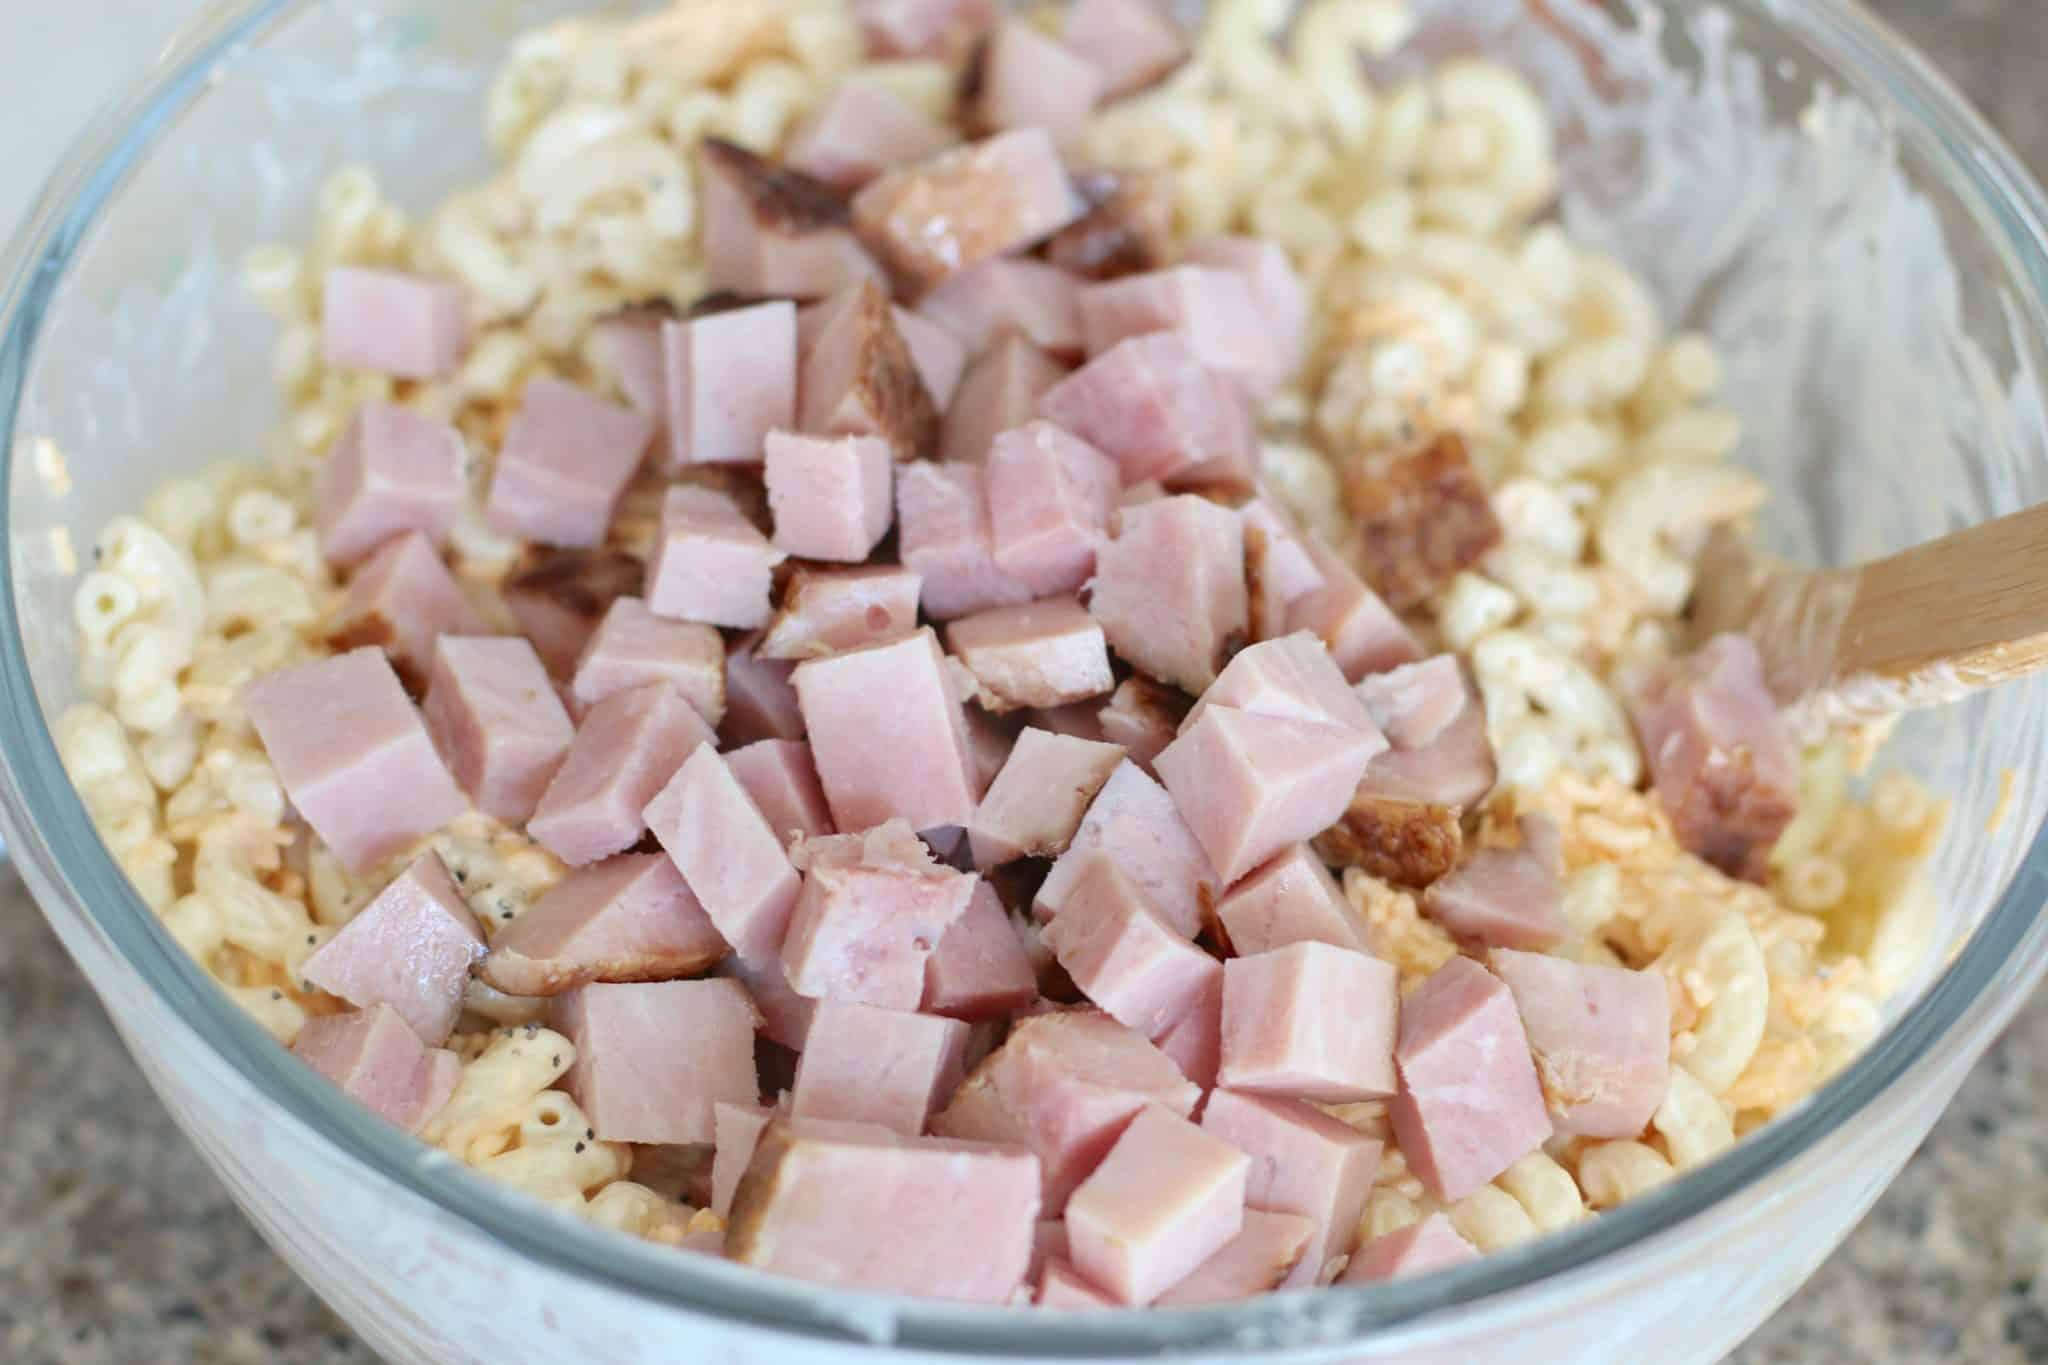 diced ham added into macaroni salad.